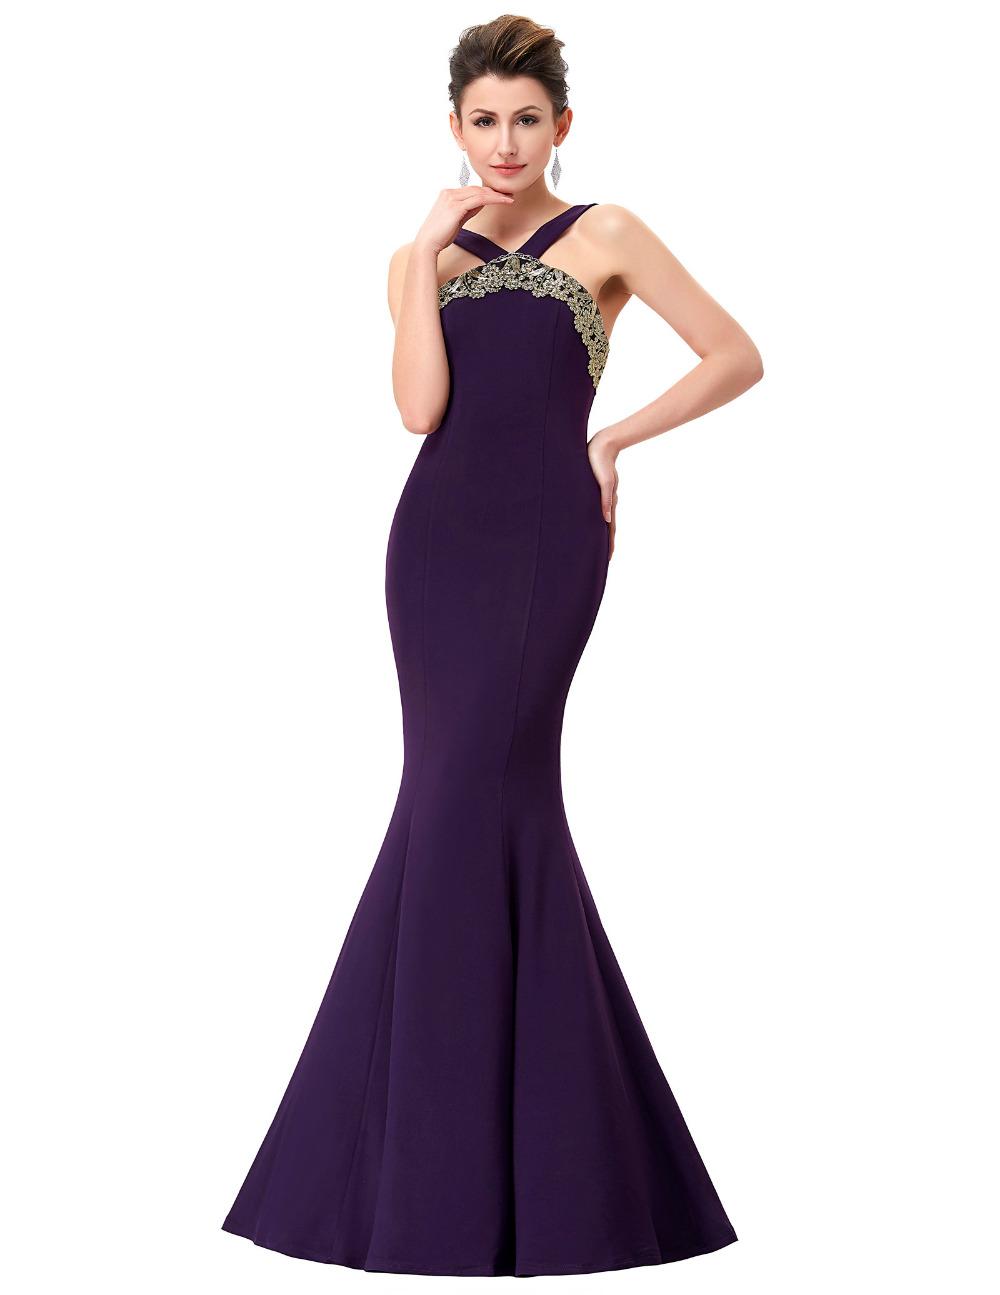 2016 Backless Purple Mermaid Evening Gowns Elegant Women Bandage Backless Formal Dress Long Evening Prom Dresses 0058(China (Mainland))